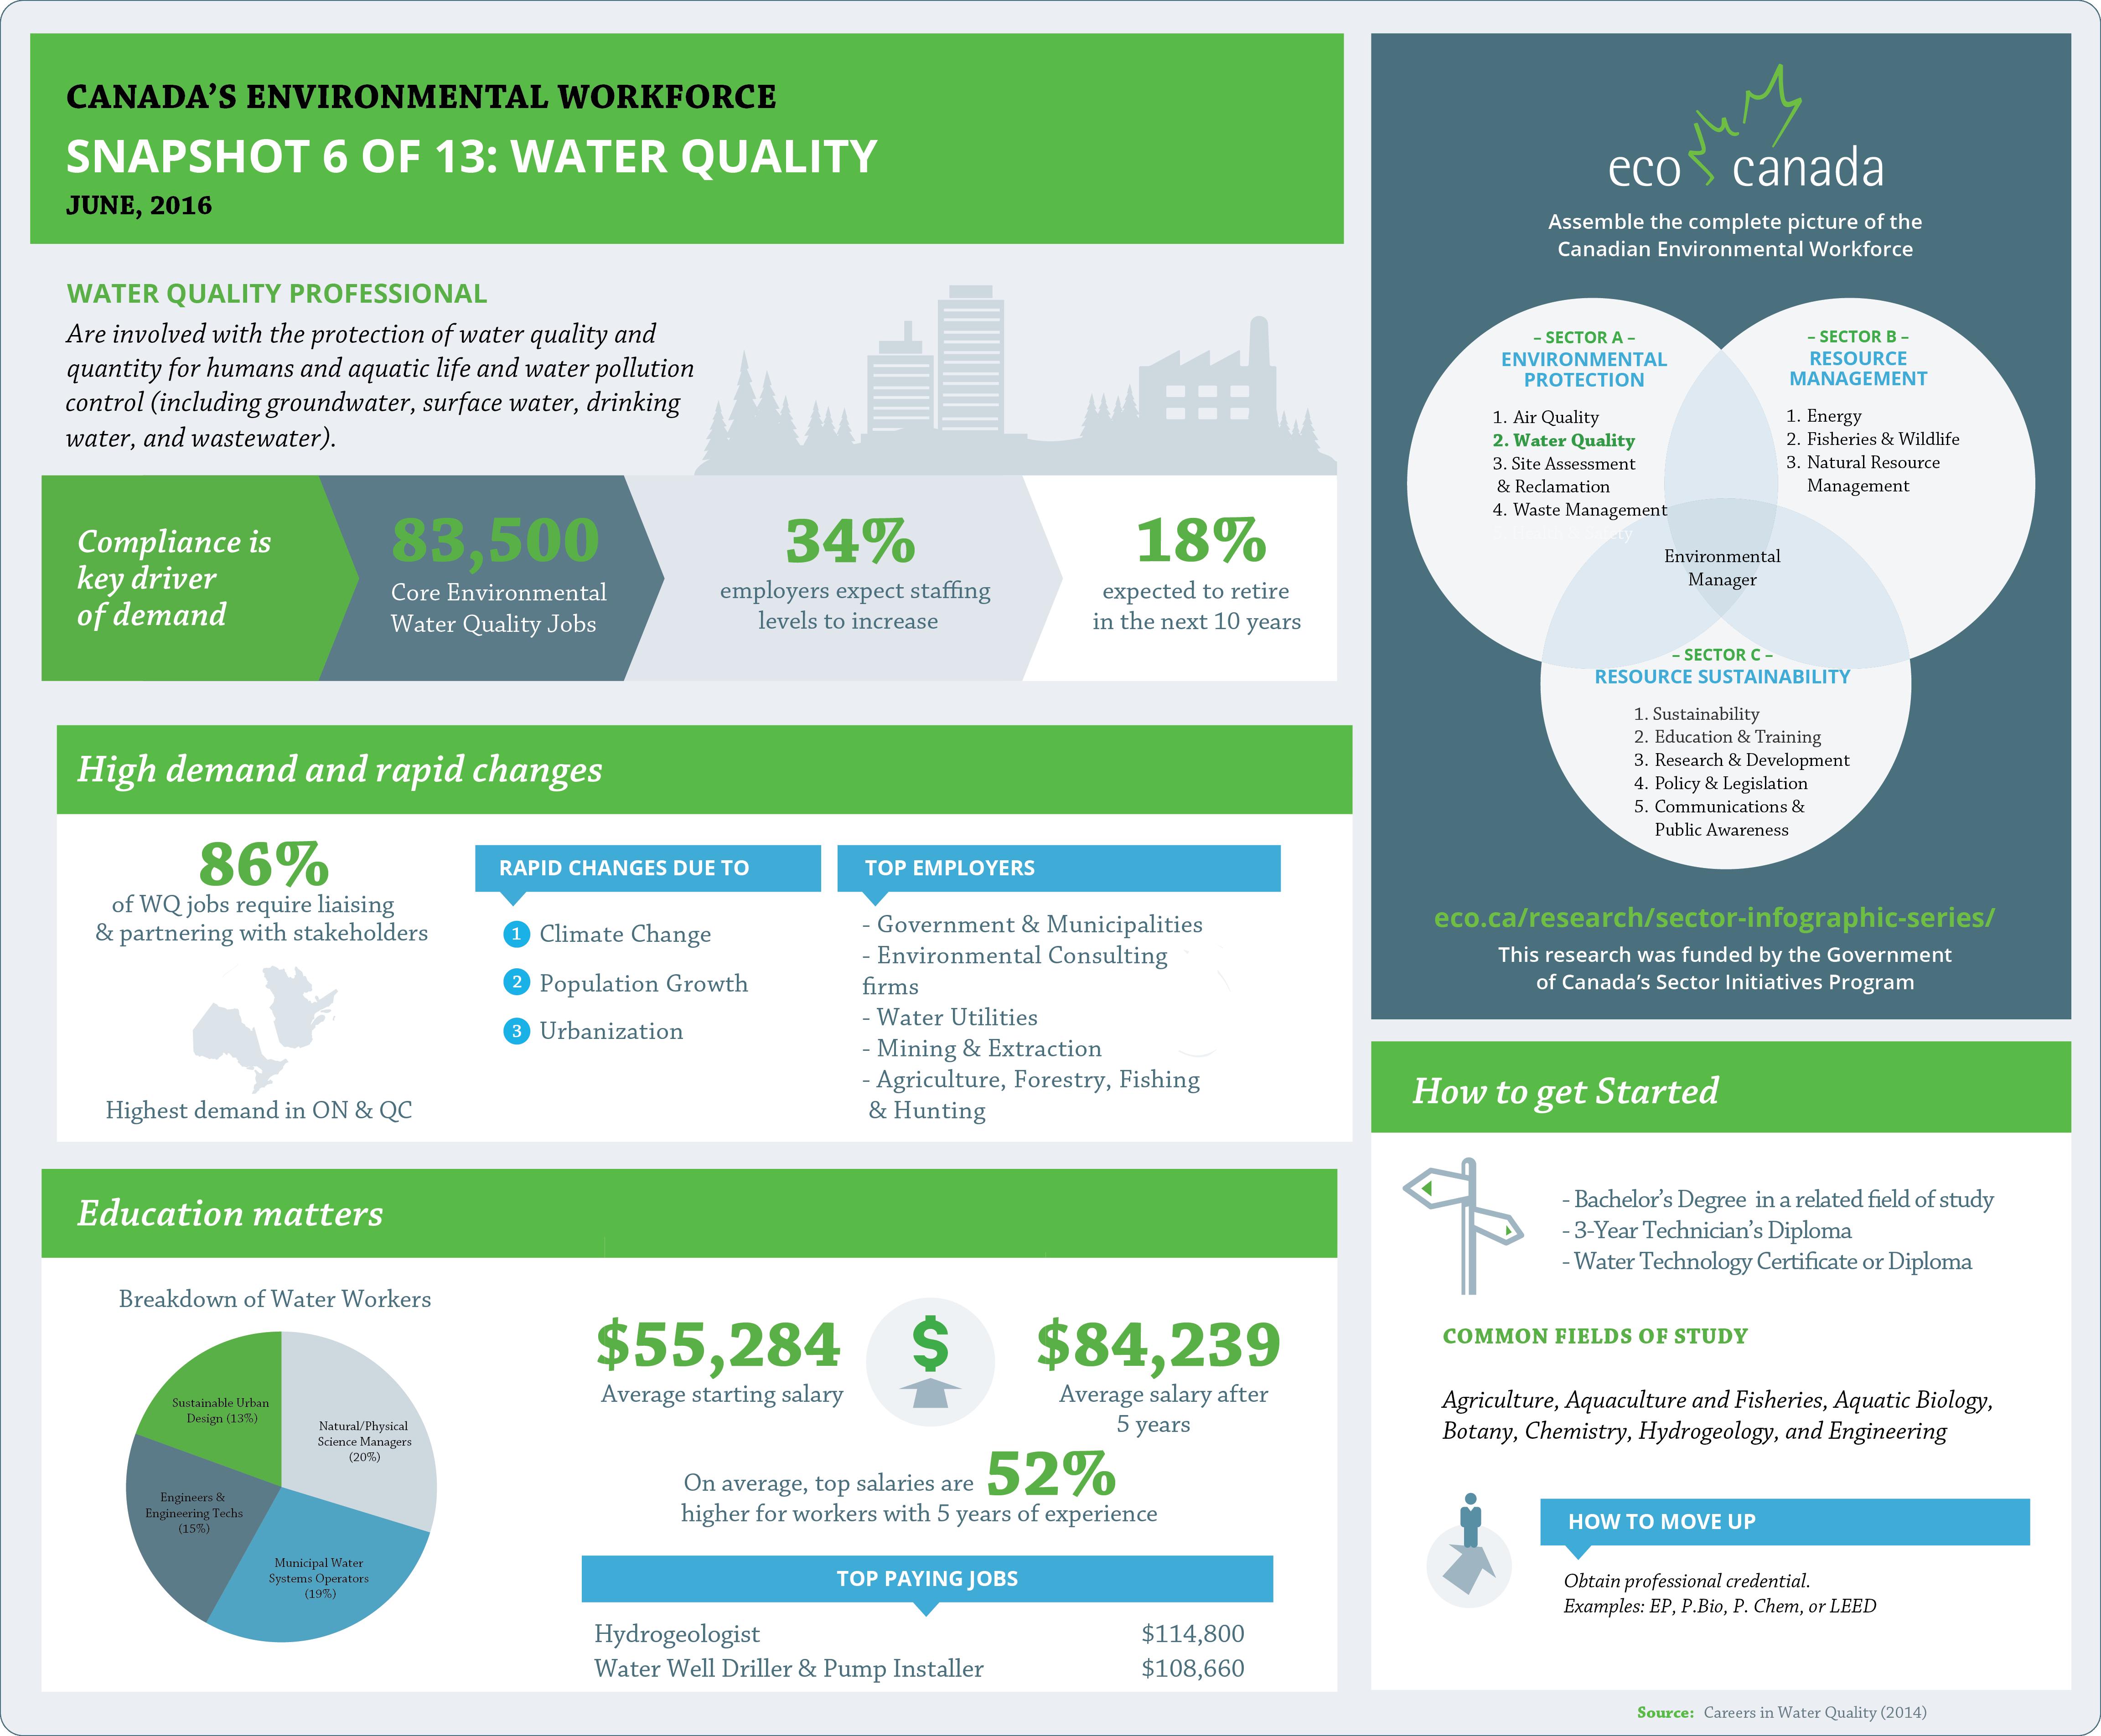 Water Quality Snapshot